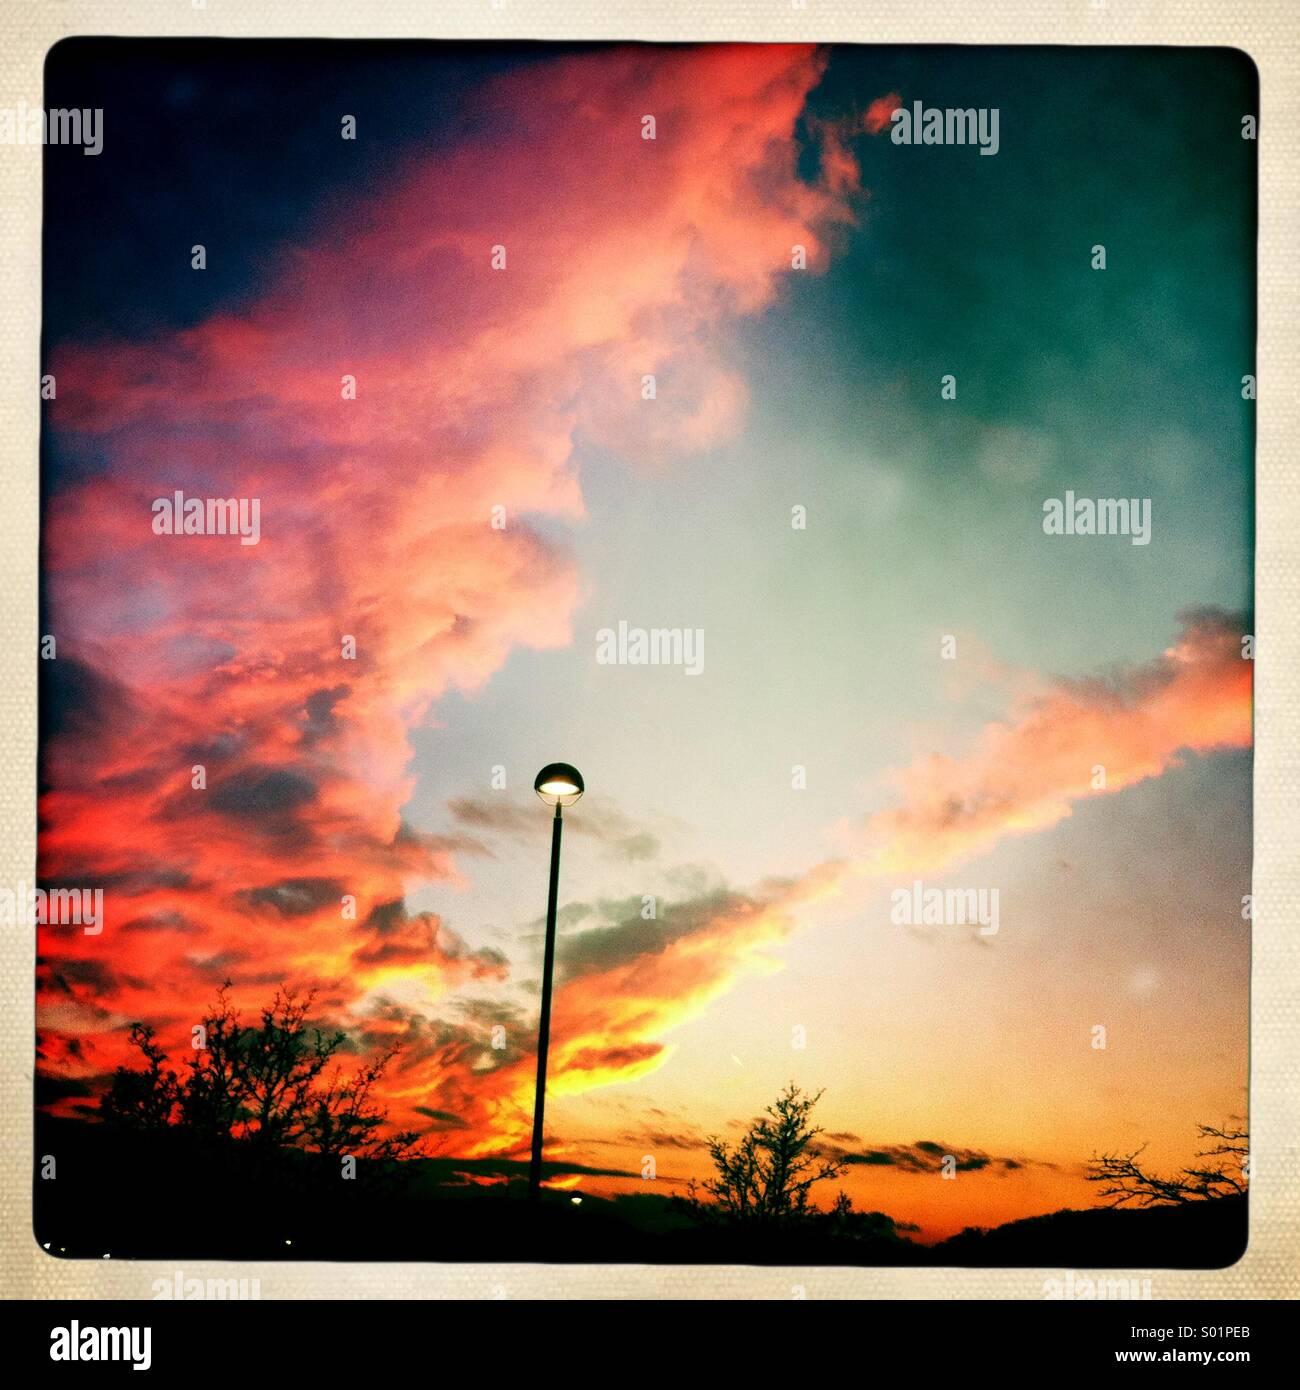 Einsamen Straßenlaterne gegen eine lebendige Sonnenuntergang Himmel. Stockbild